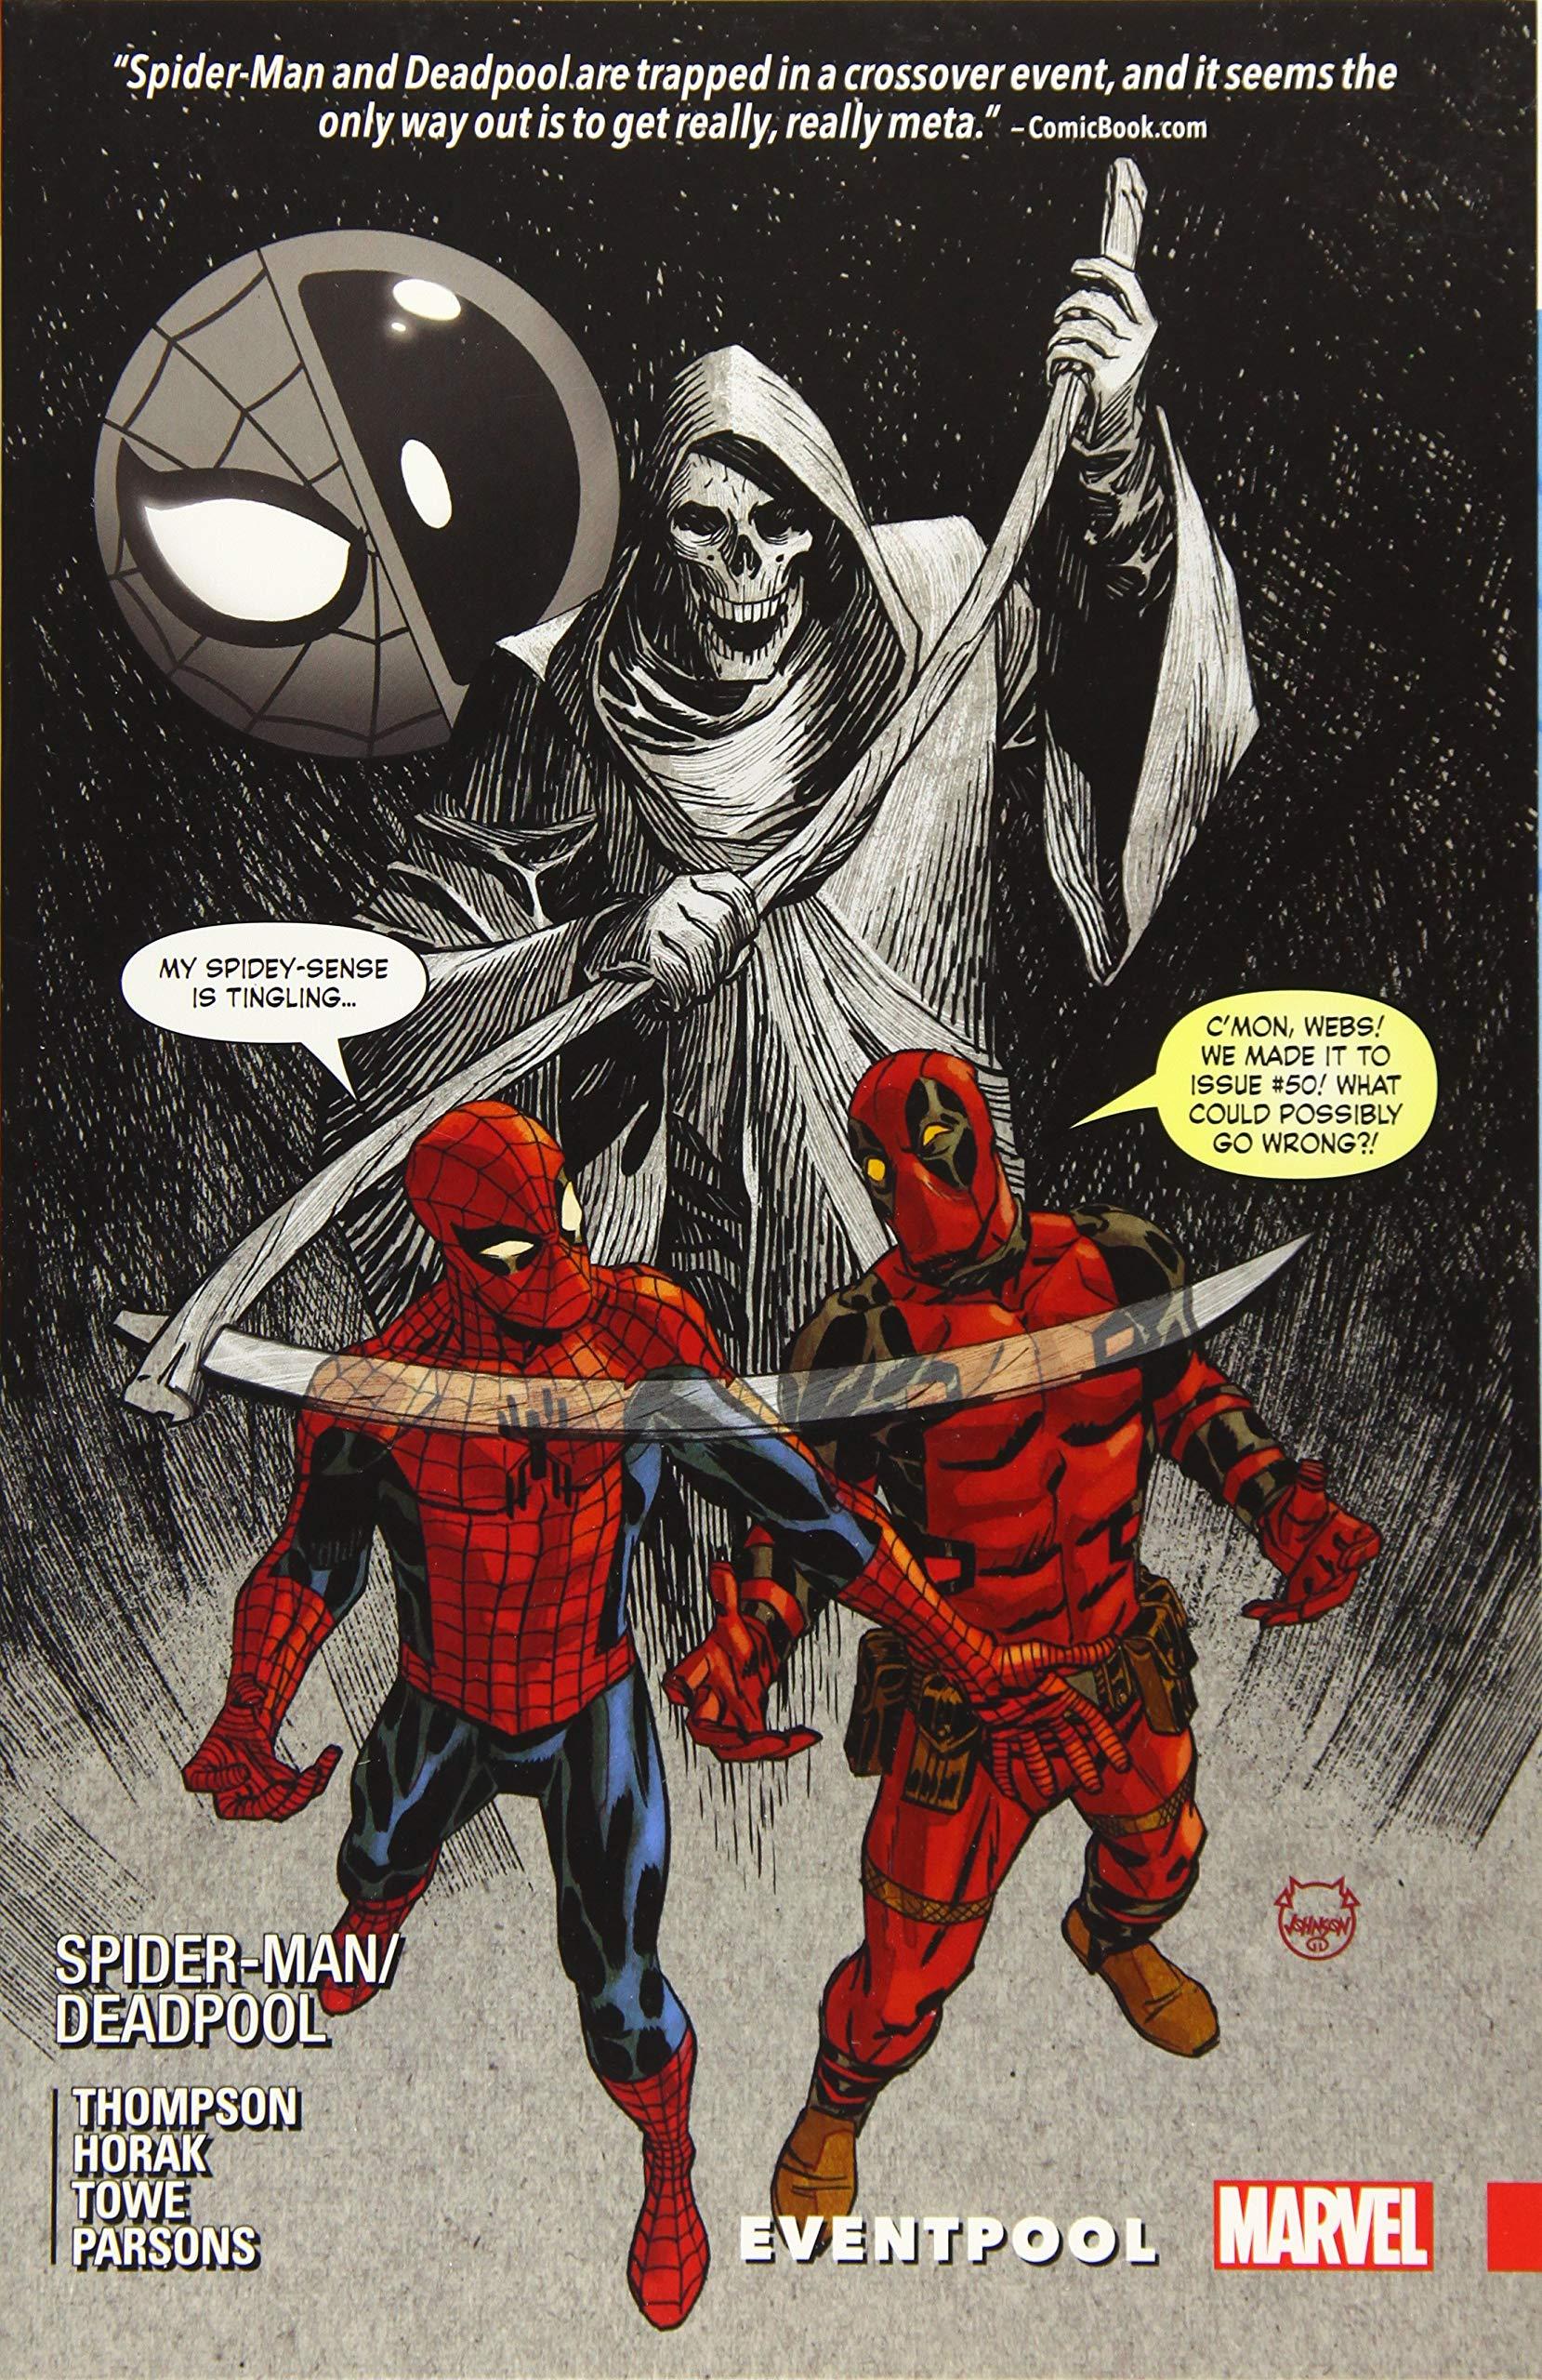 Spider Man Deadpool Vol 9 Eventpool product image